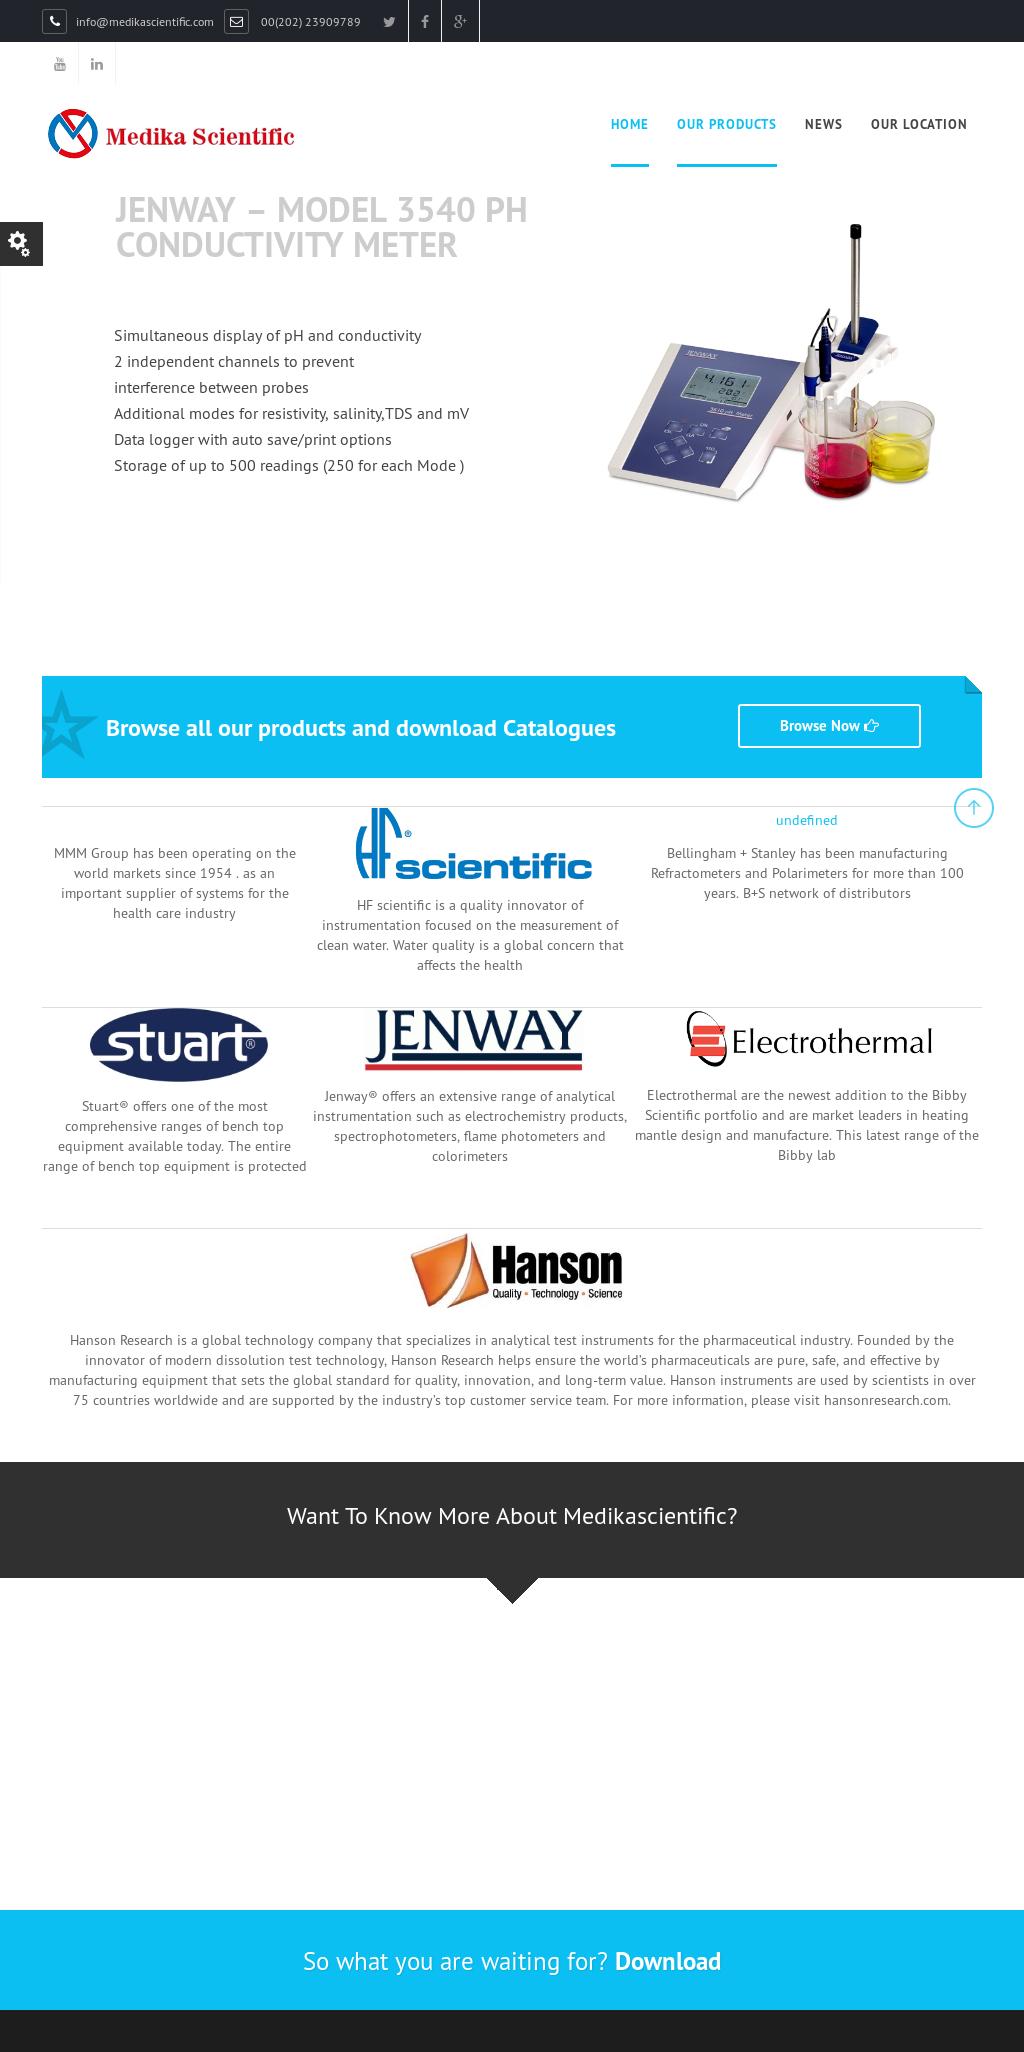 Medika Scientific Competitors, Revenue and Employees - Owler Company